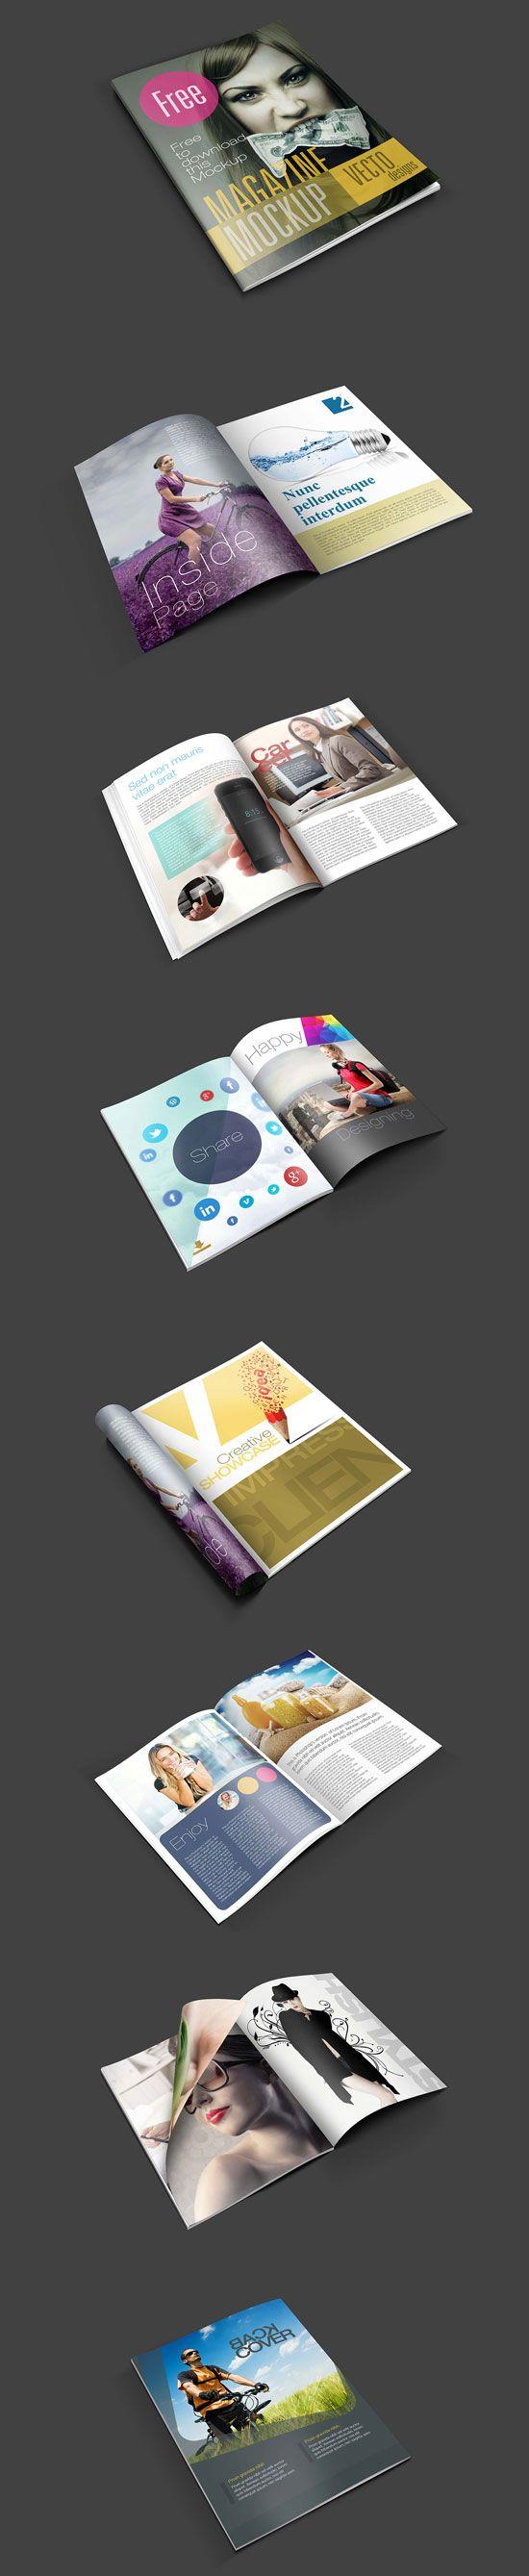 Free Magazine Mockup | For more free magazine mockup templates visit iBrandStudio.com